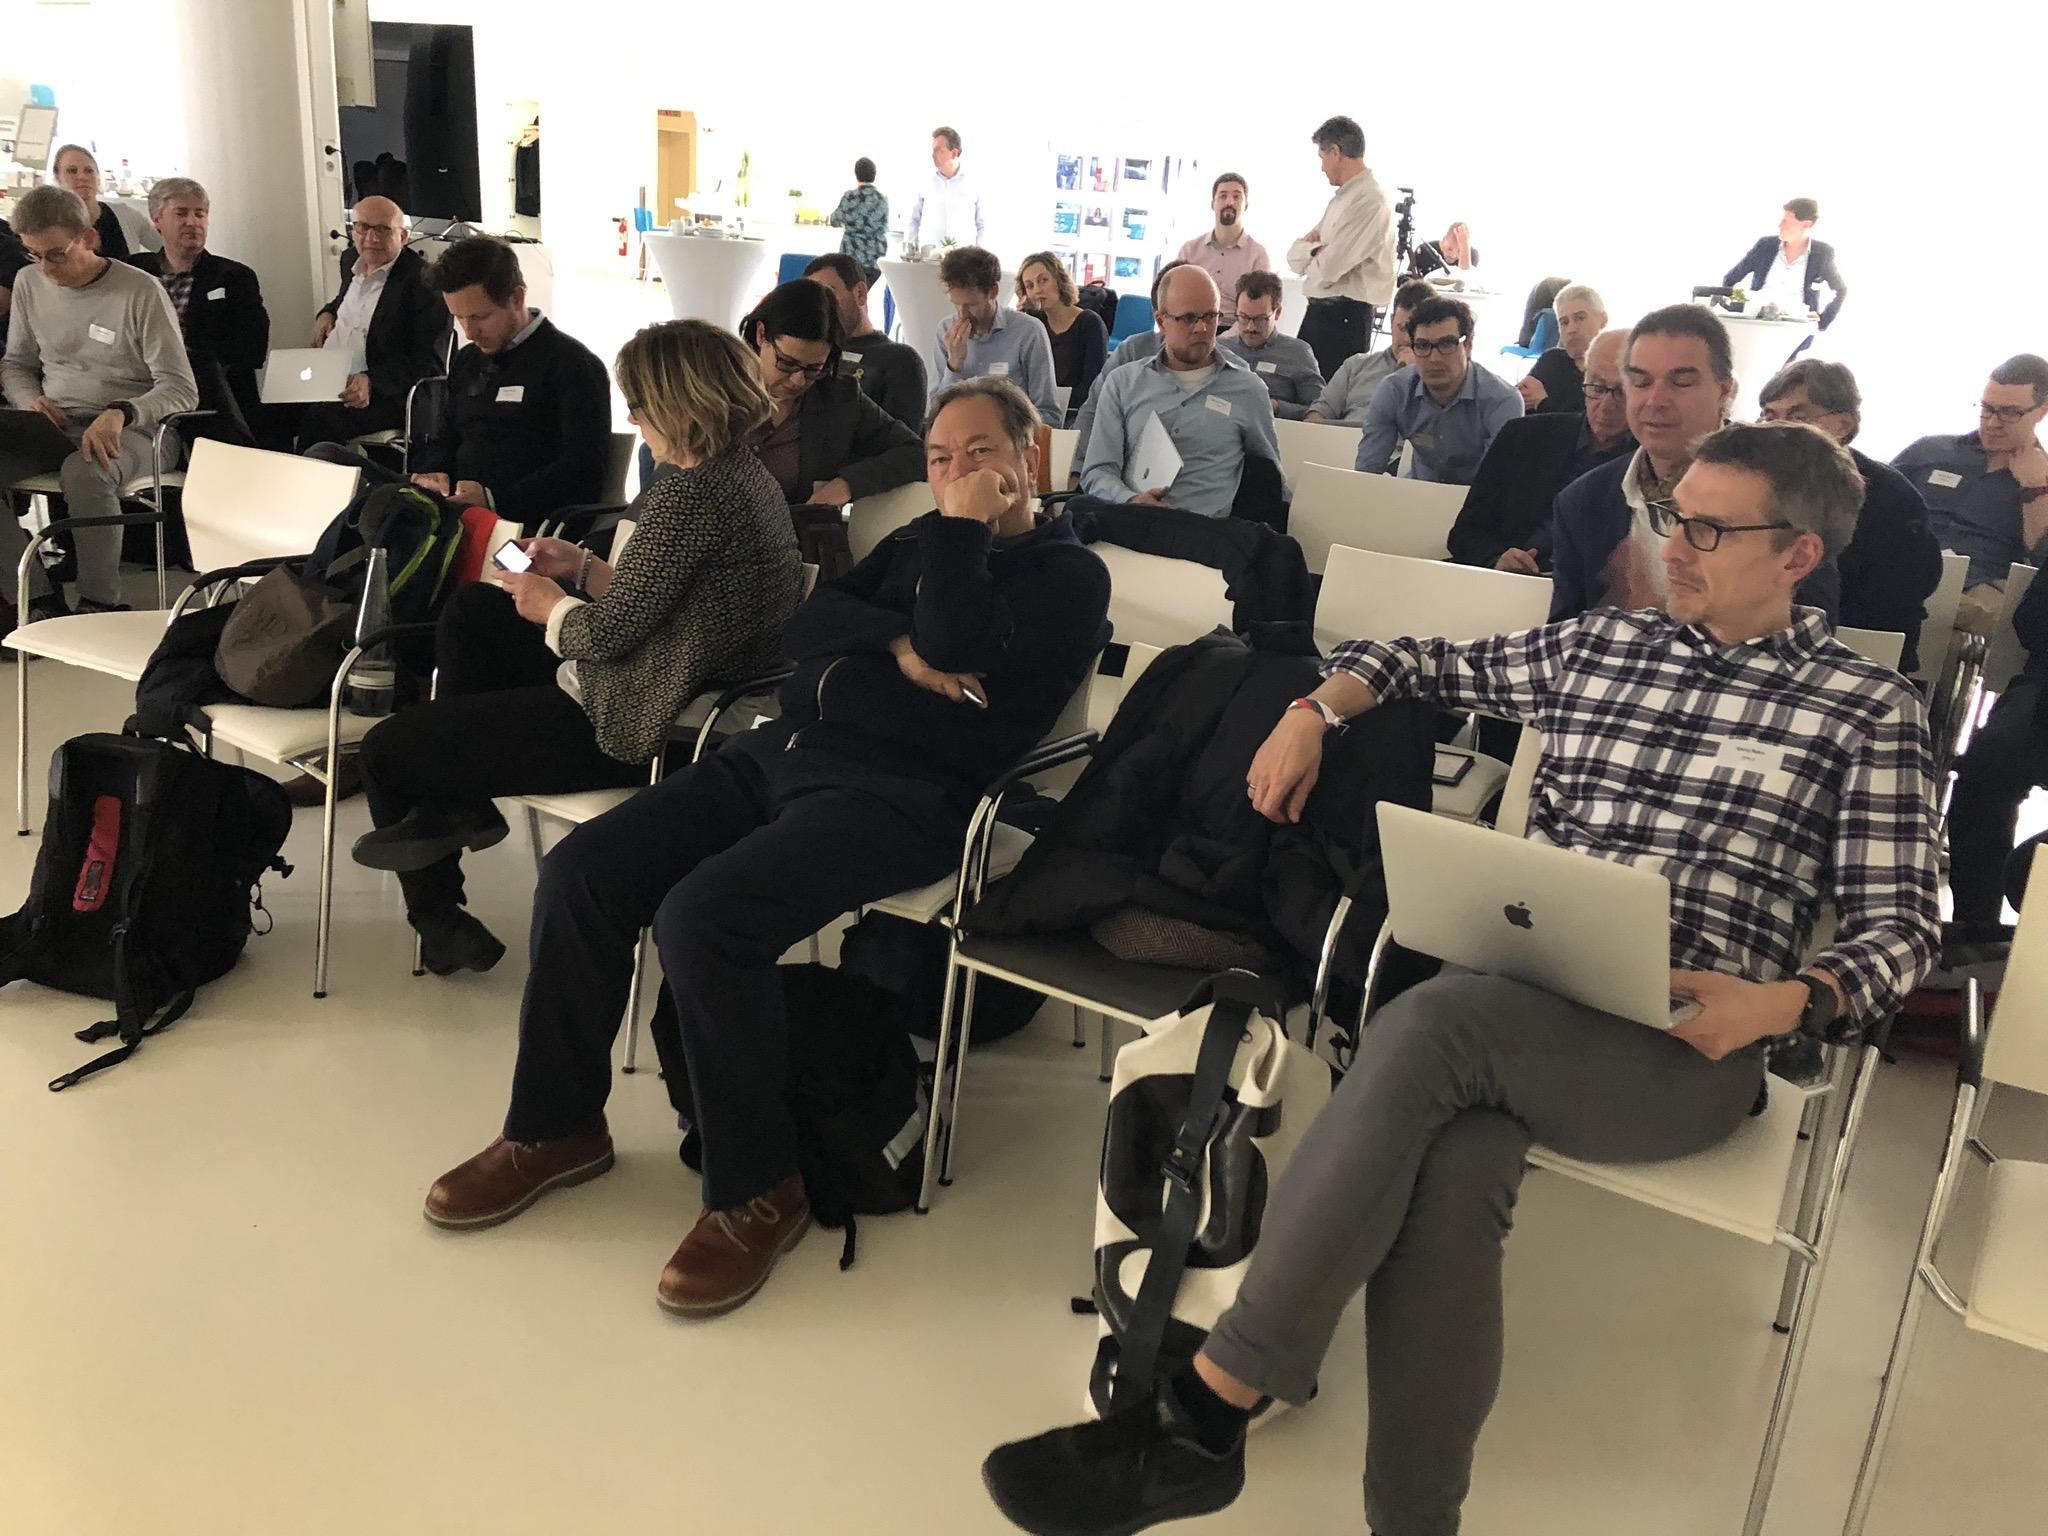 Humane AI research plans